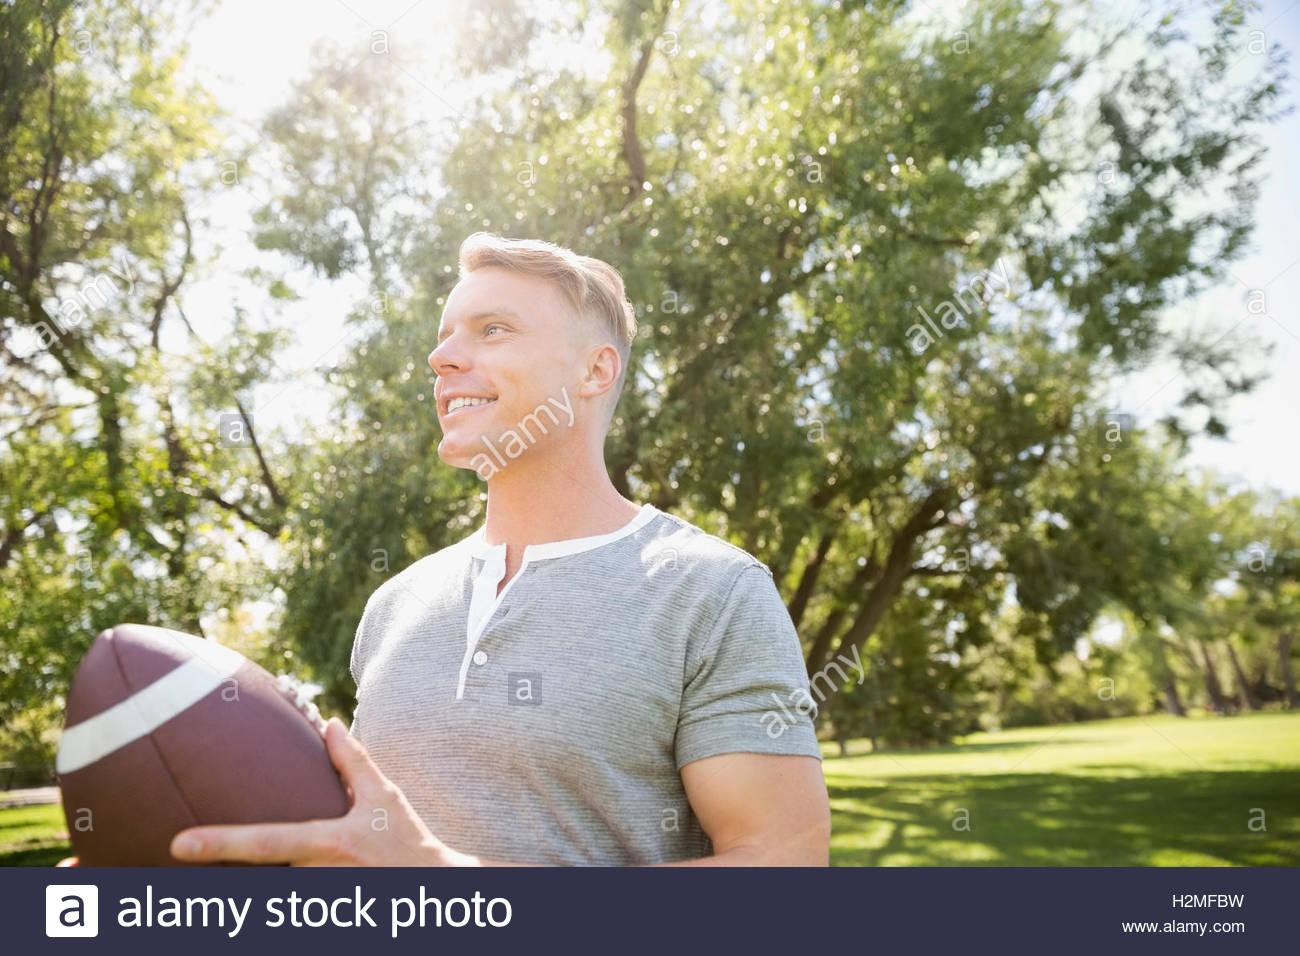 Lächelnder Mann Fußball spielen in sonnigen Sommerpark Stockbild